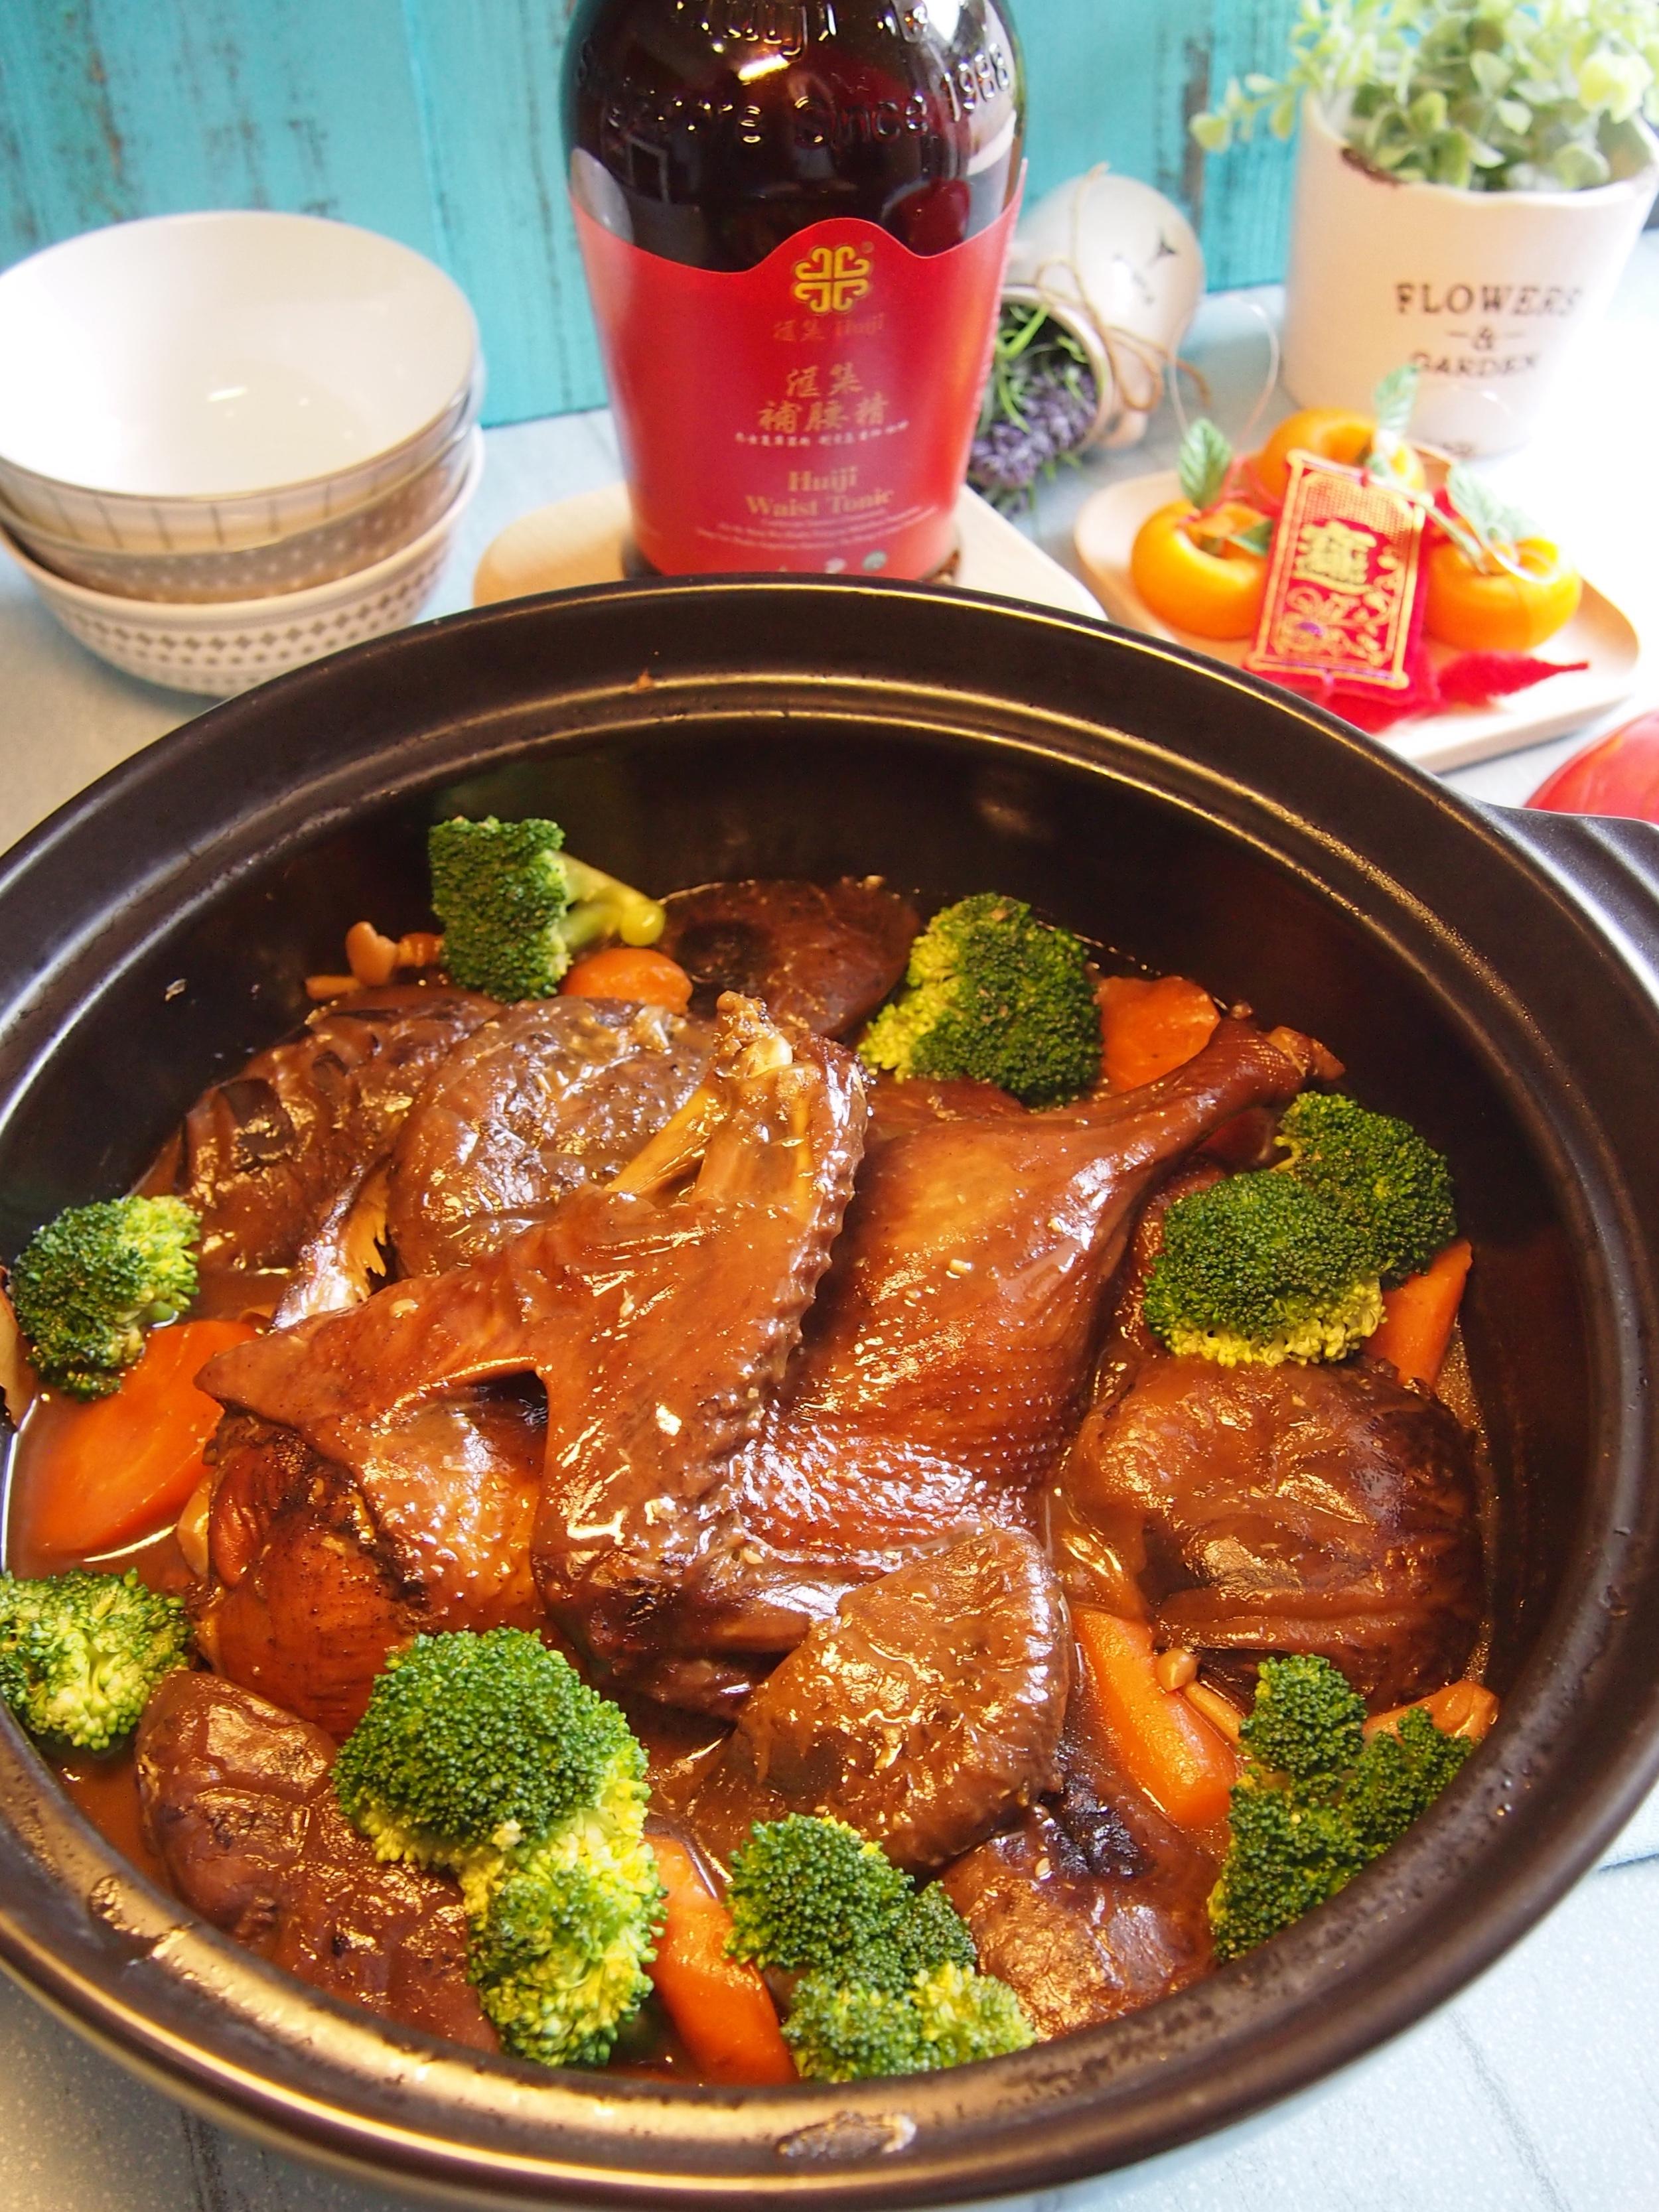 CNY Reunion Dinner Recipe: Prosperity Duck w/ Mushrooms in Herbal Sauce 药材蘑菇发财鸭